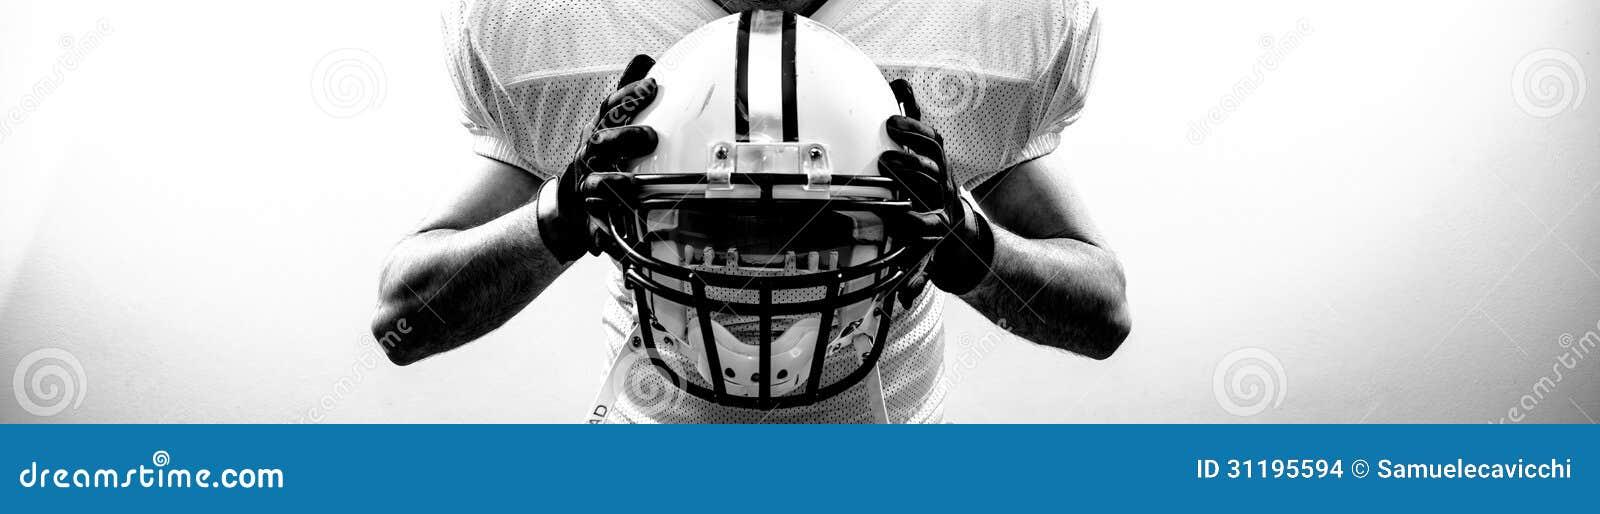 De Amerikaanse Voetbal runningback strateeg neemt een helm